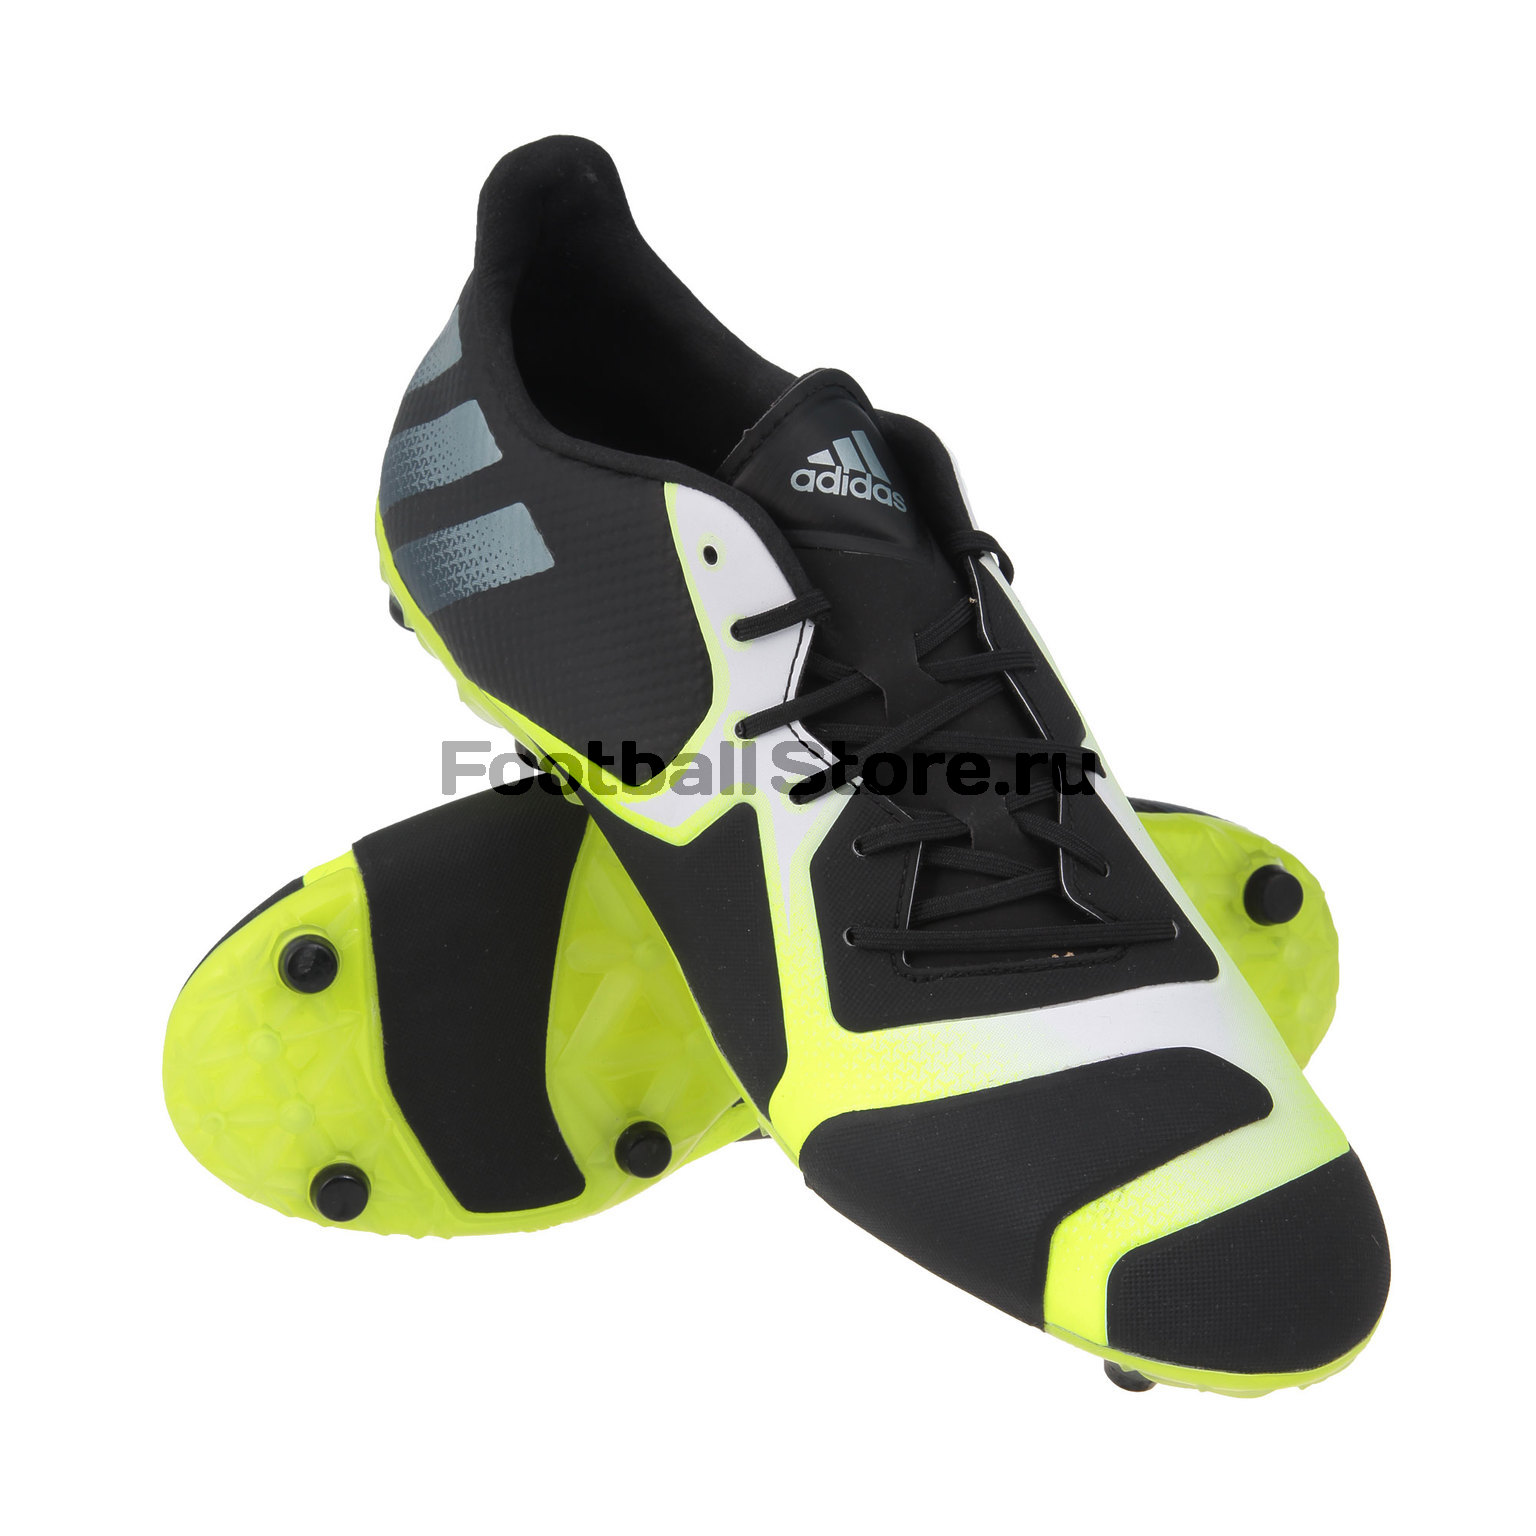 Игровые бутсы Adidas Бутсы Adidas Ace 16+ TKRZ S31928 цены онлайн